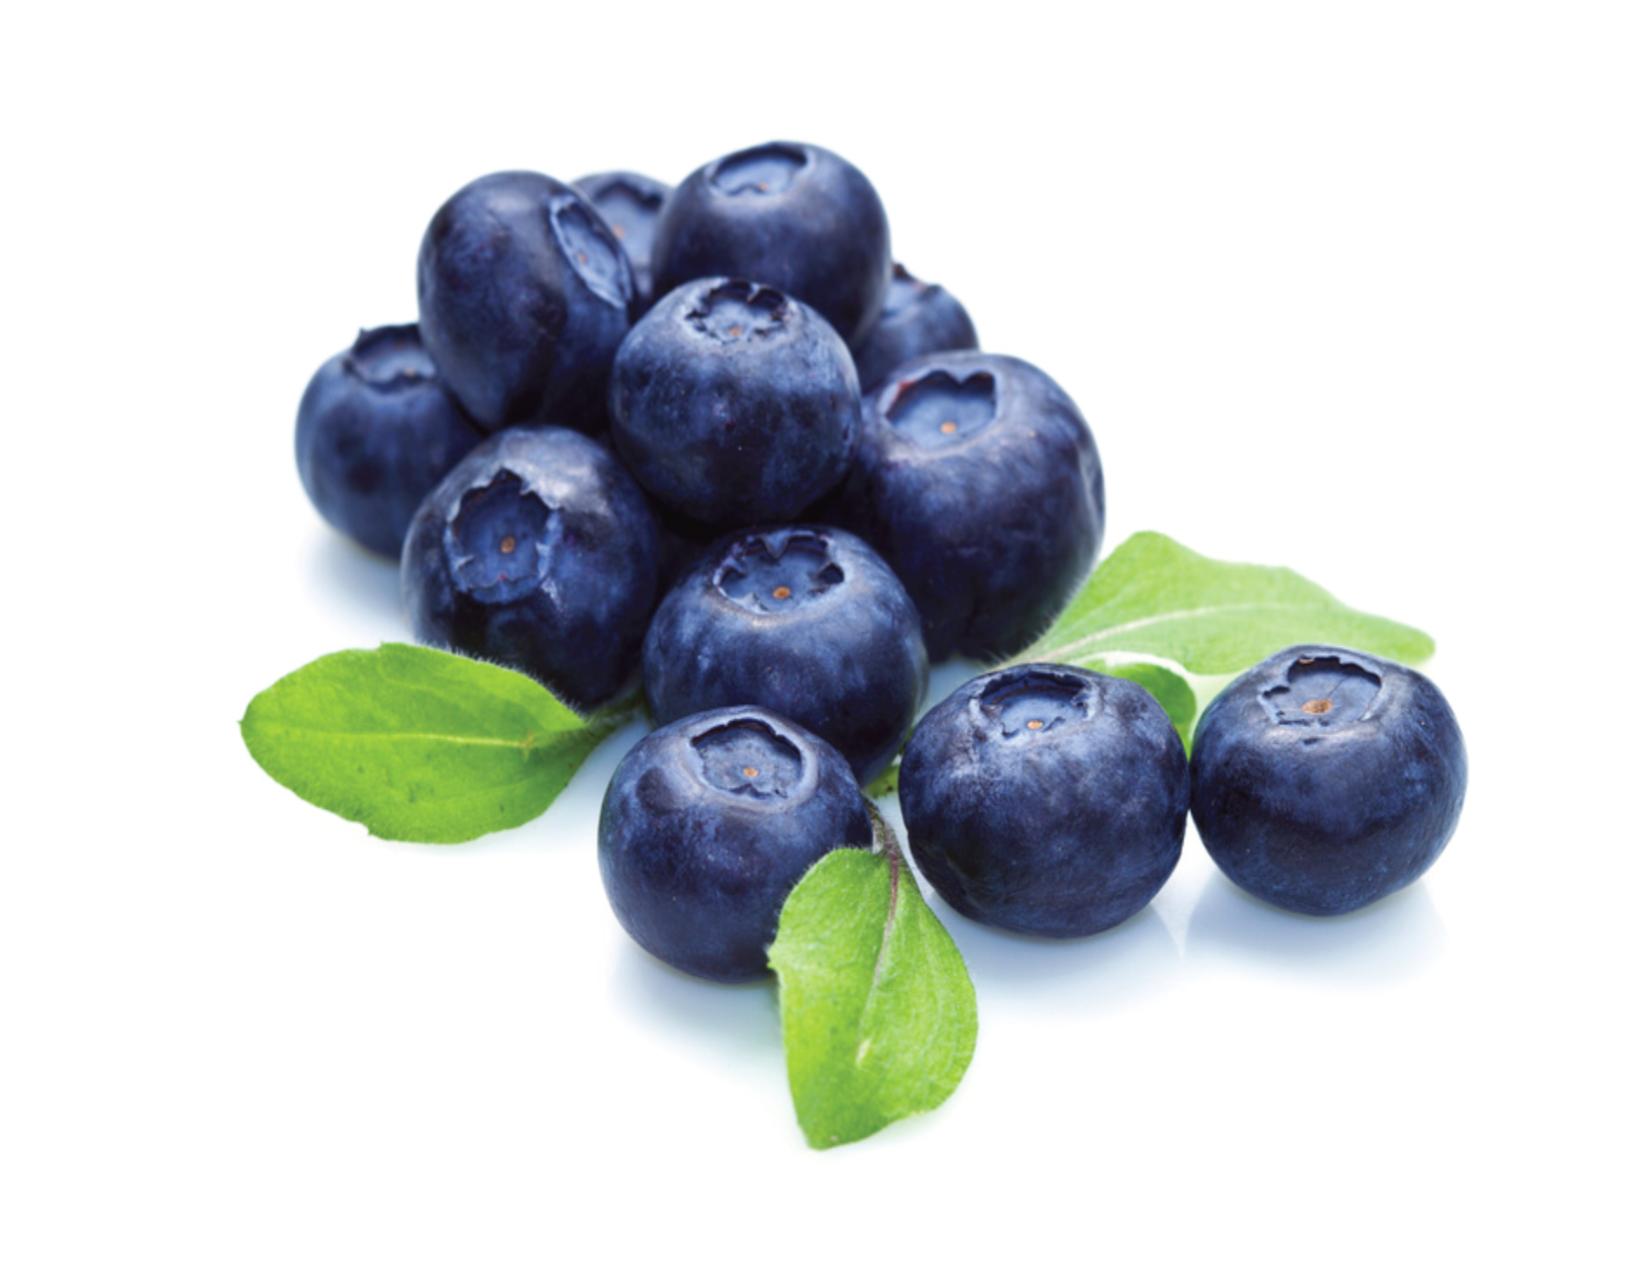 defeating diabetes - Blueberries